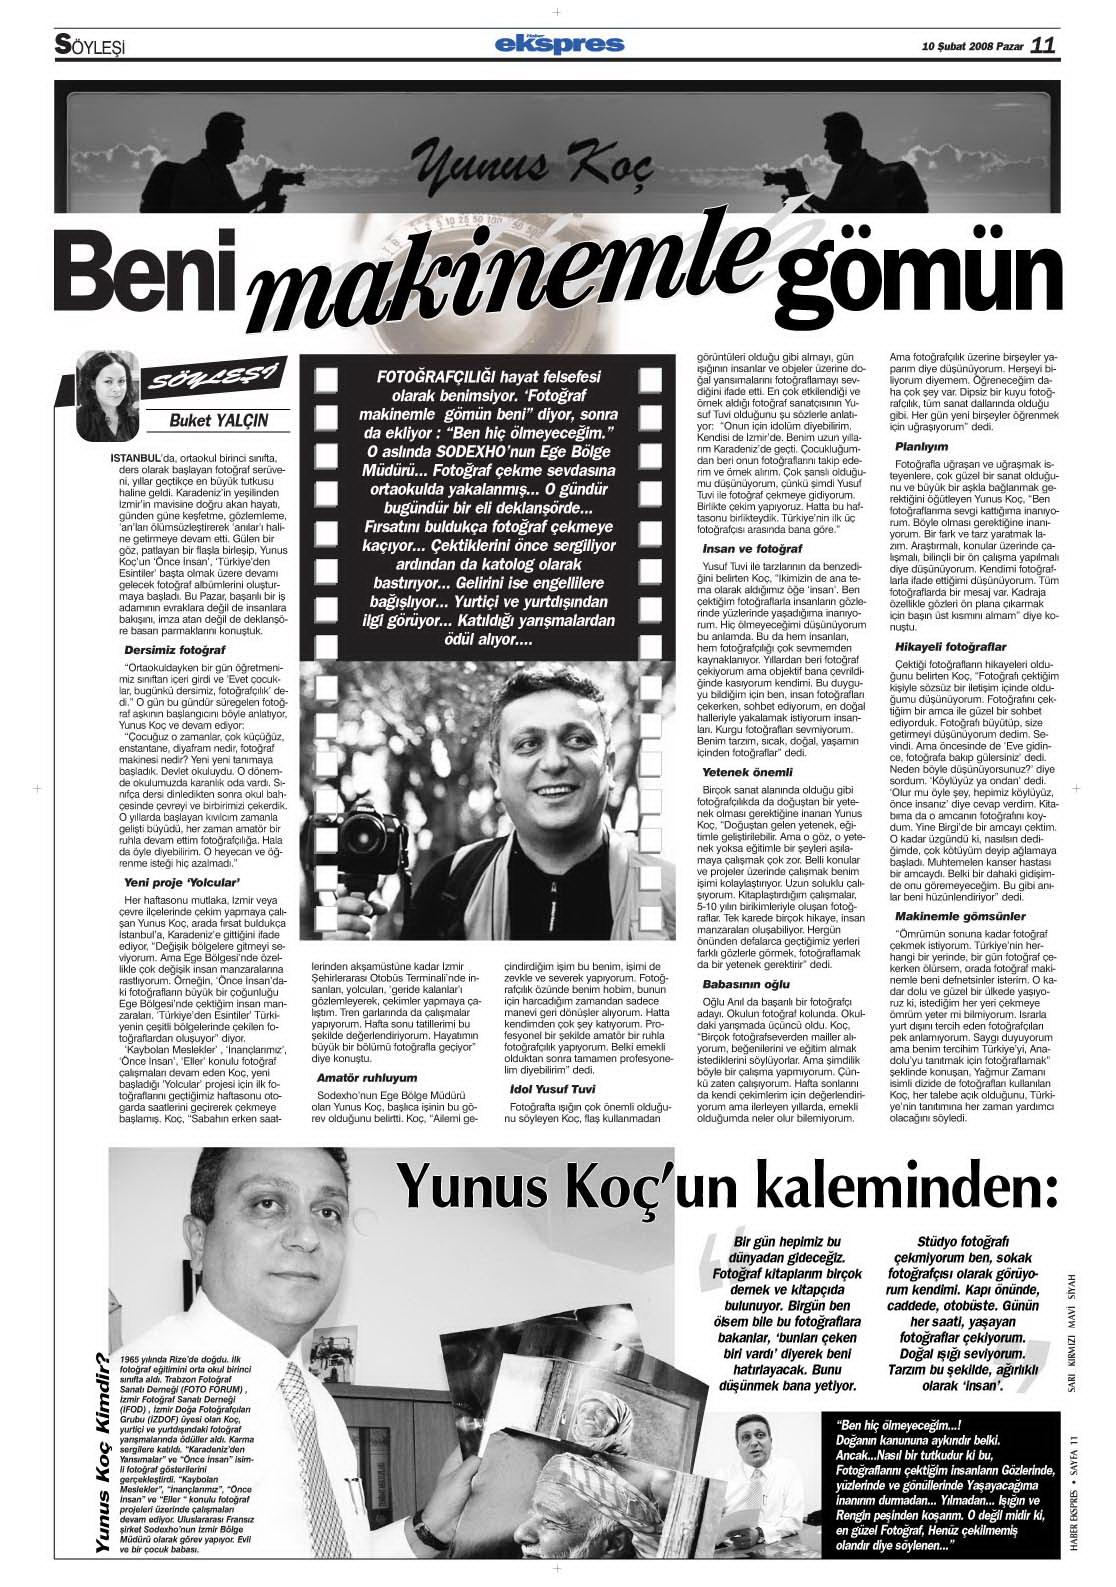 2008-02-19 Yunus Koç